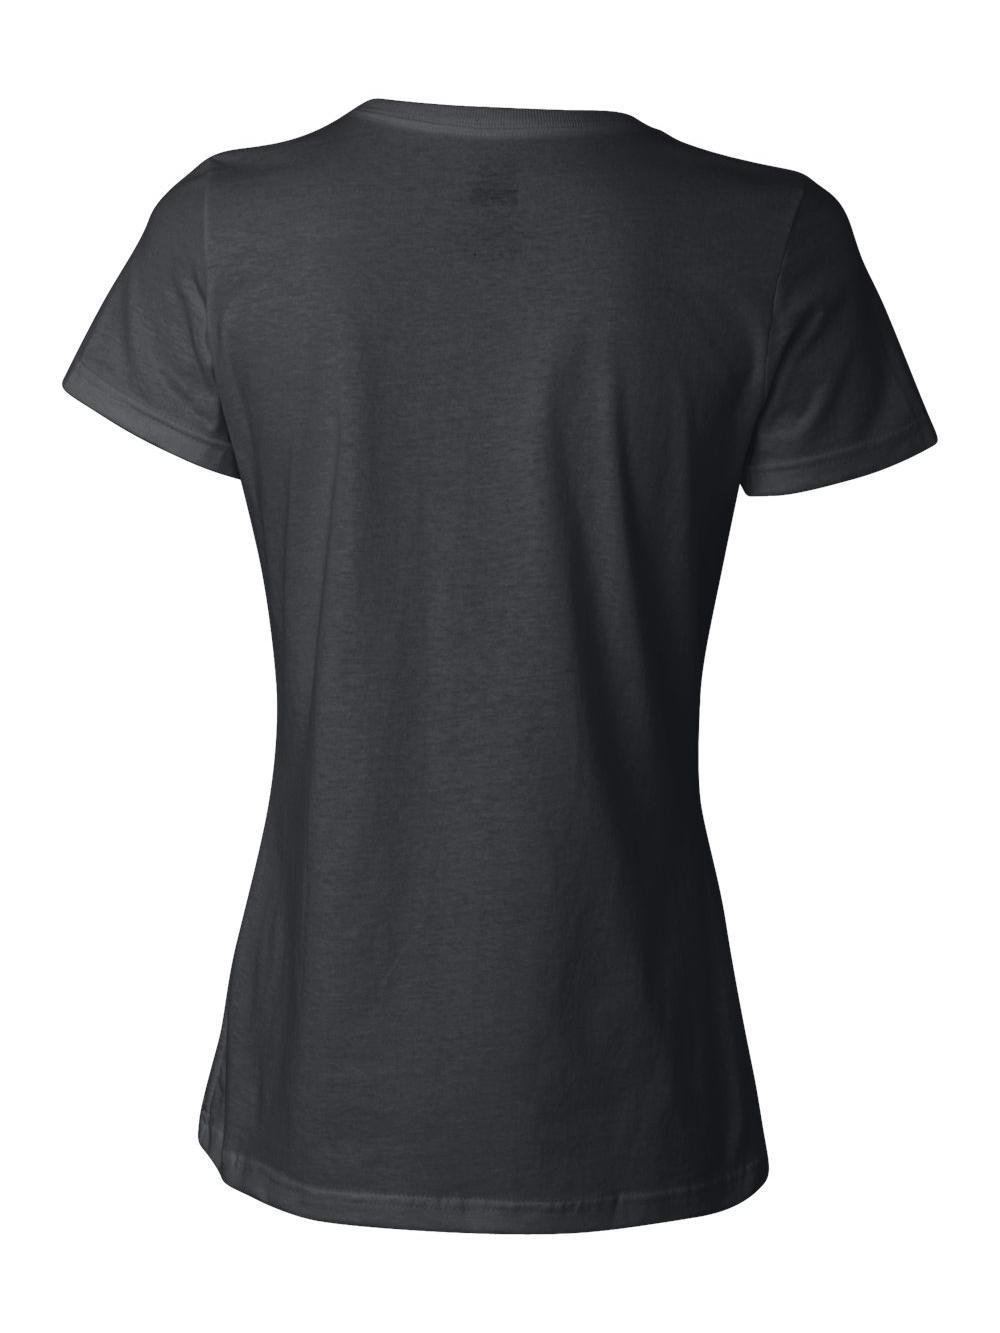 Fruit-of-the-Loom-HD-Cotton-Women-039-s-Short-Sleeve-T-Shirt-L3930R thumbnail 7